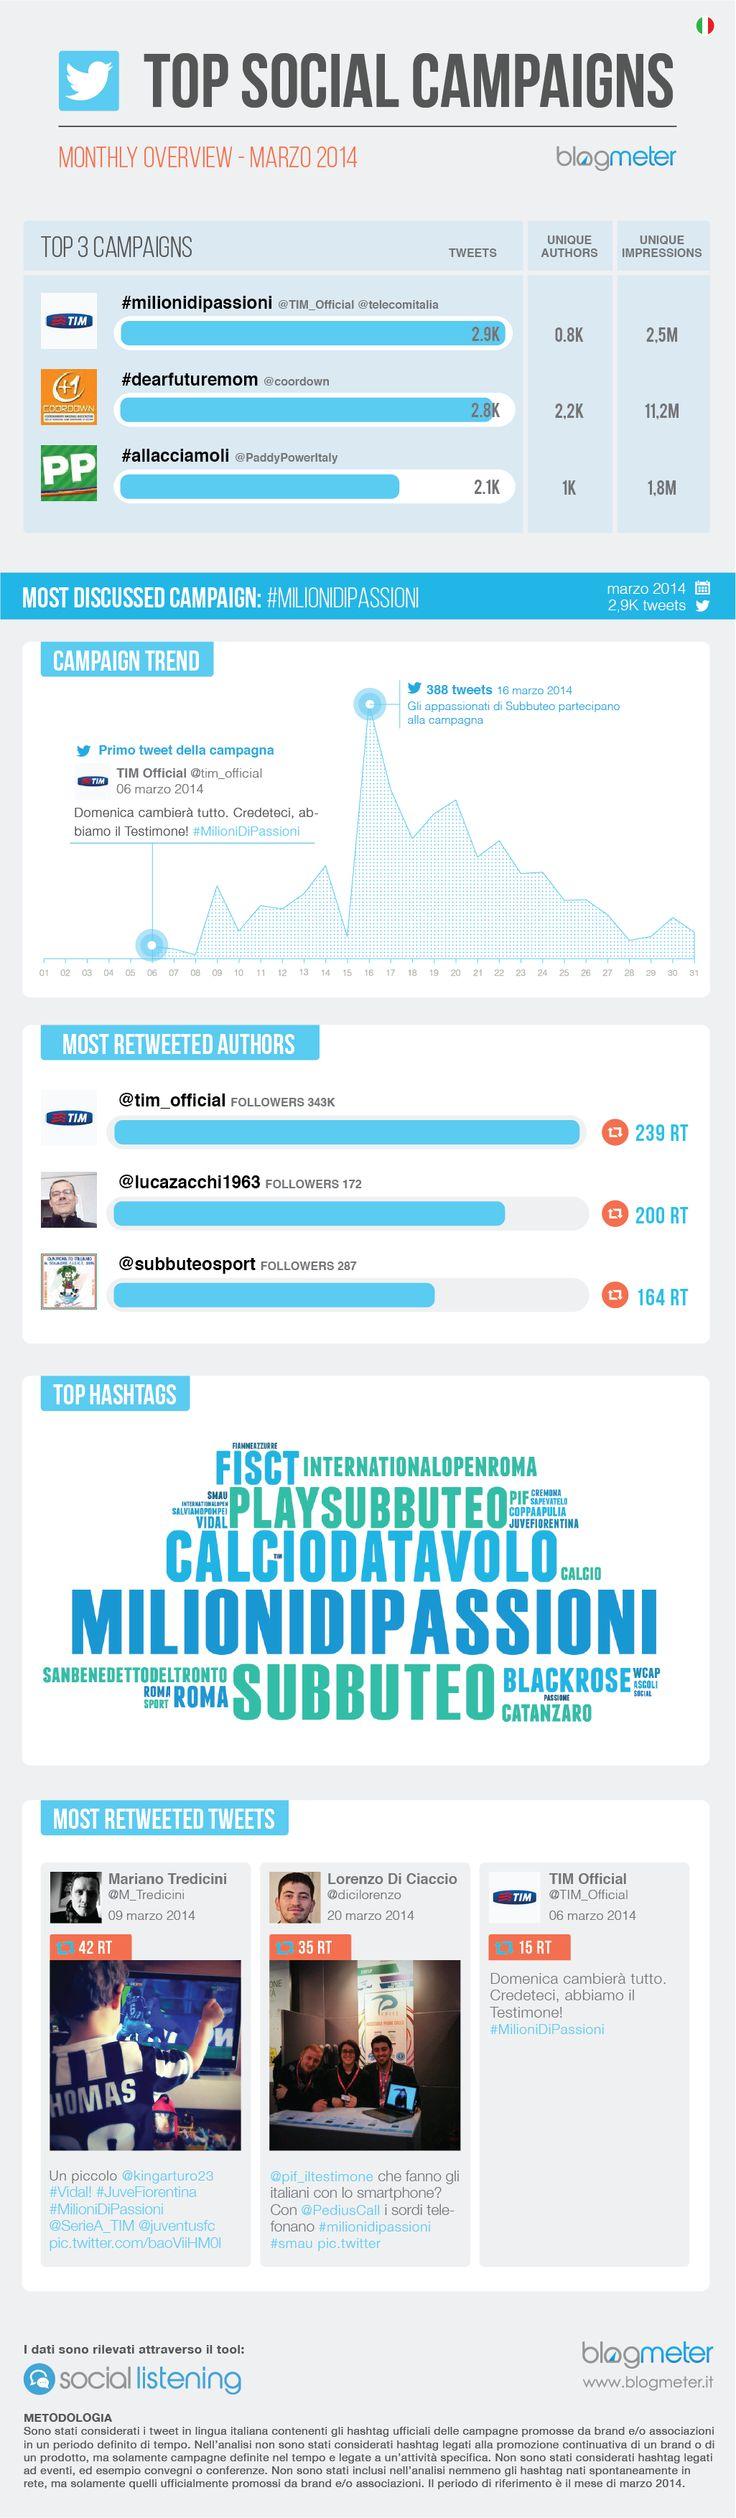 #TopSocialCampaigns Marzo 2014  http://www.blogmeter.it/blog/2014/04/30/top-social-campaigns-marzo-gli-italiani-condividono-milionidipassioni/